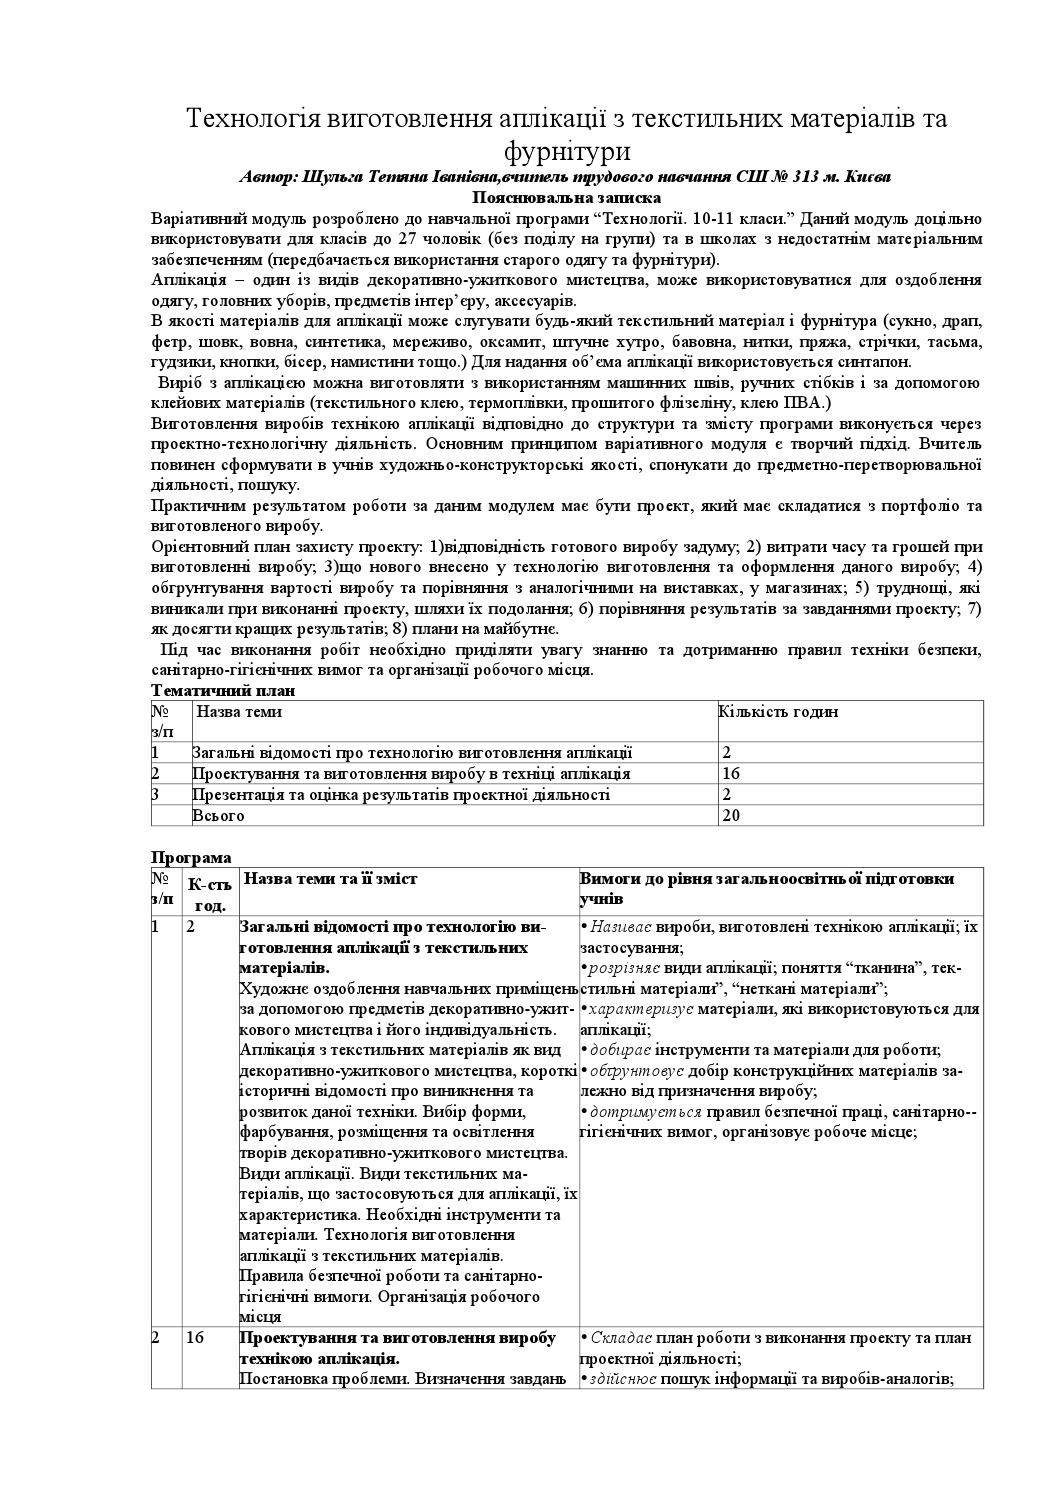 Tehnology variativ by Варвара fdfd - issuu 7b45973daf923